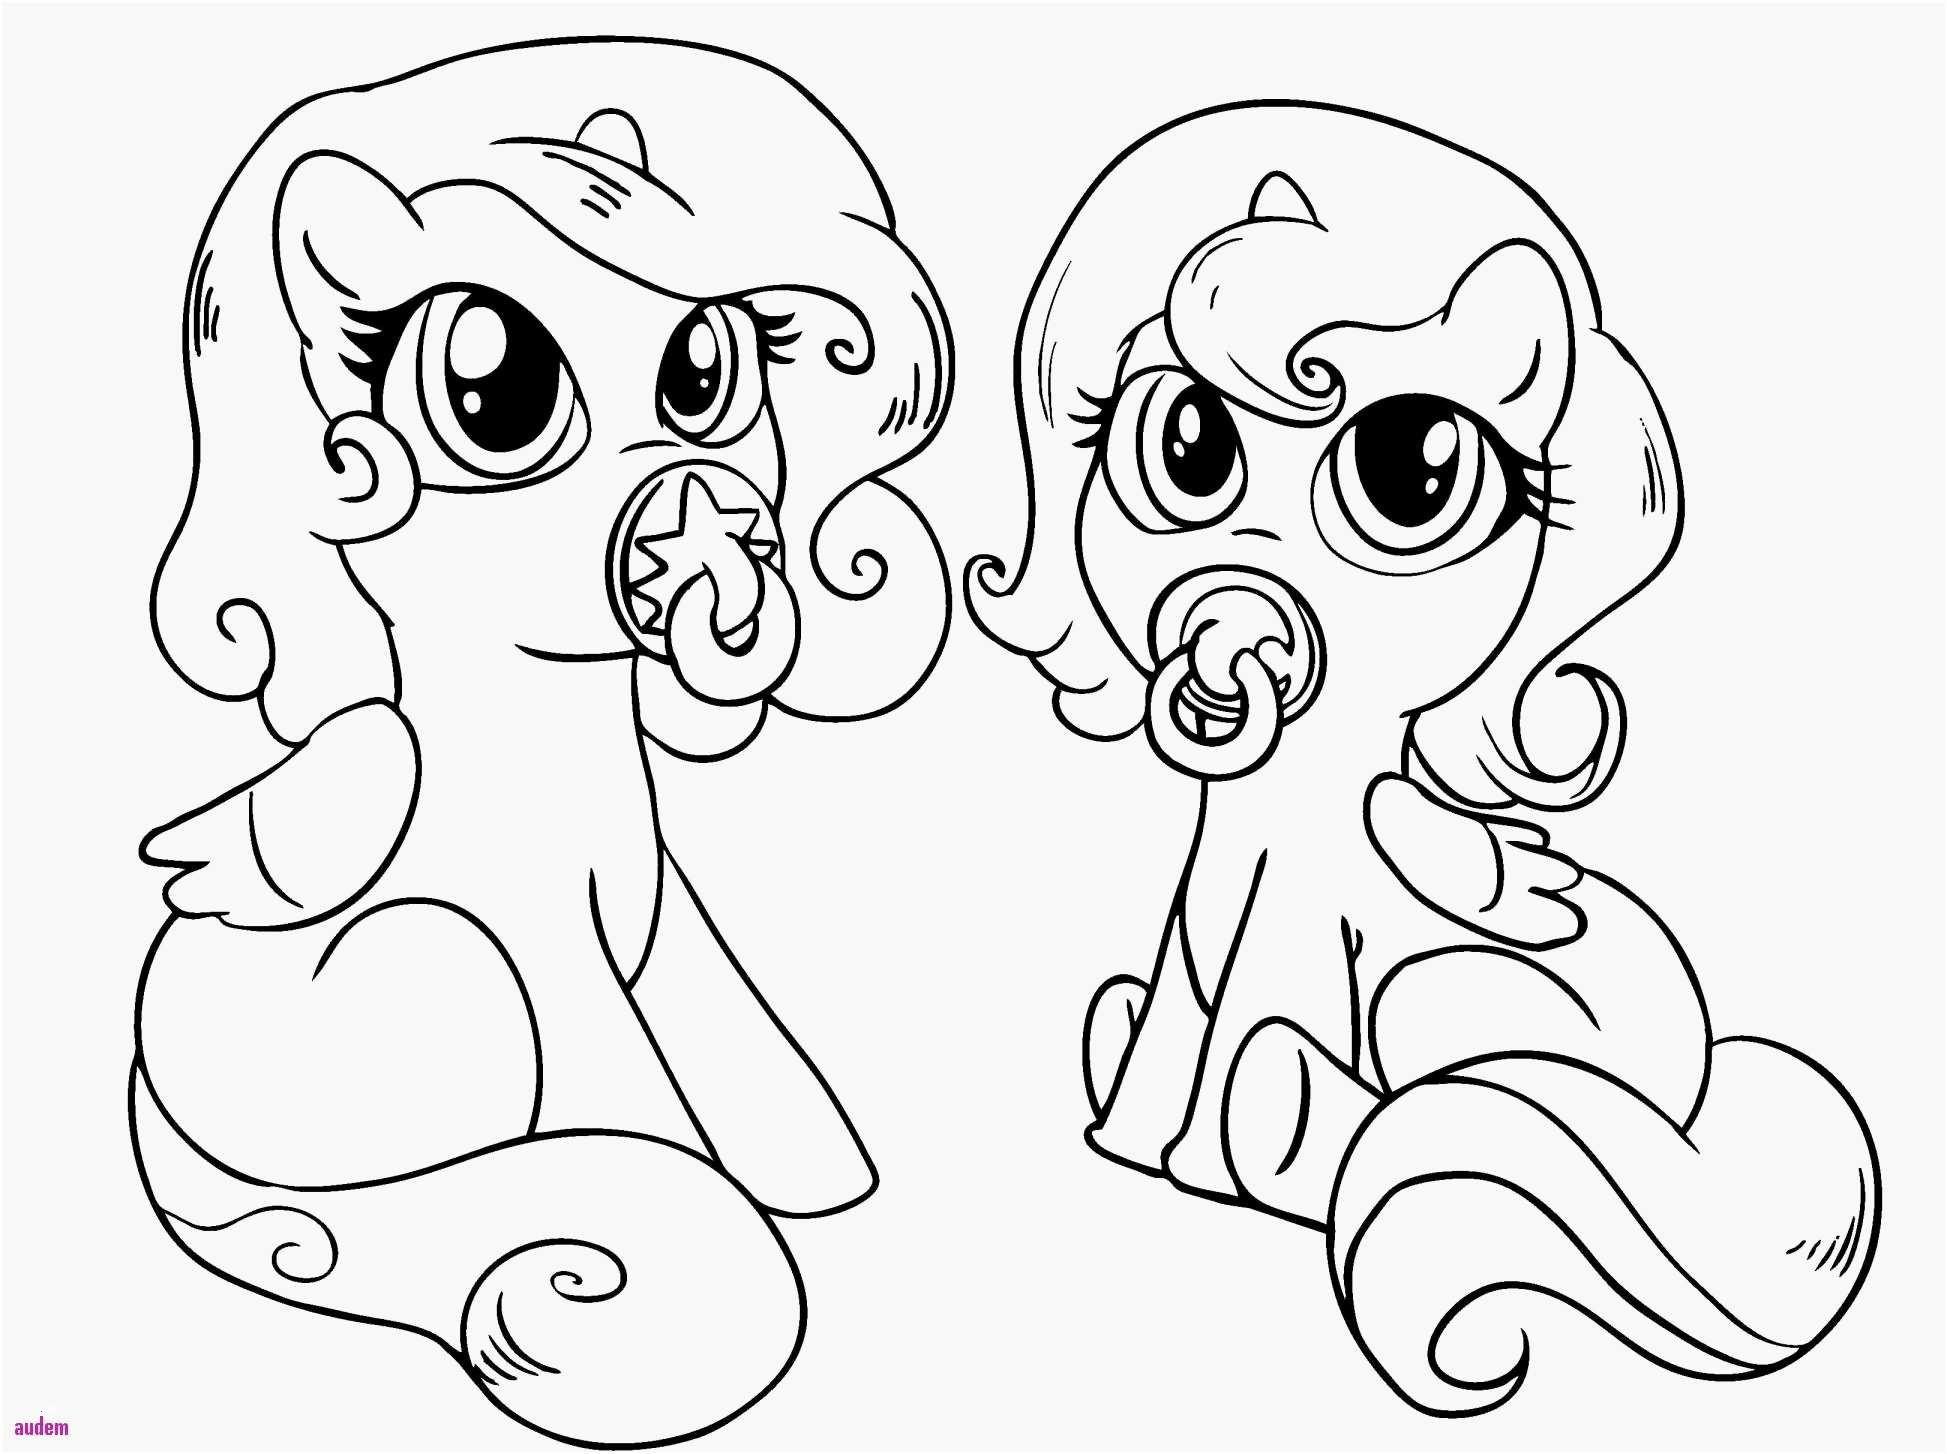 Ausmalbild My Little Pony Neu 40 My Little Pony Friendship is Magic Ausmalbilder Scoredatscore Bild